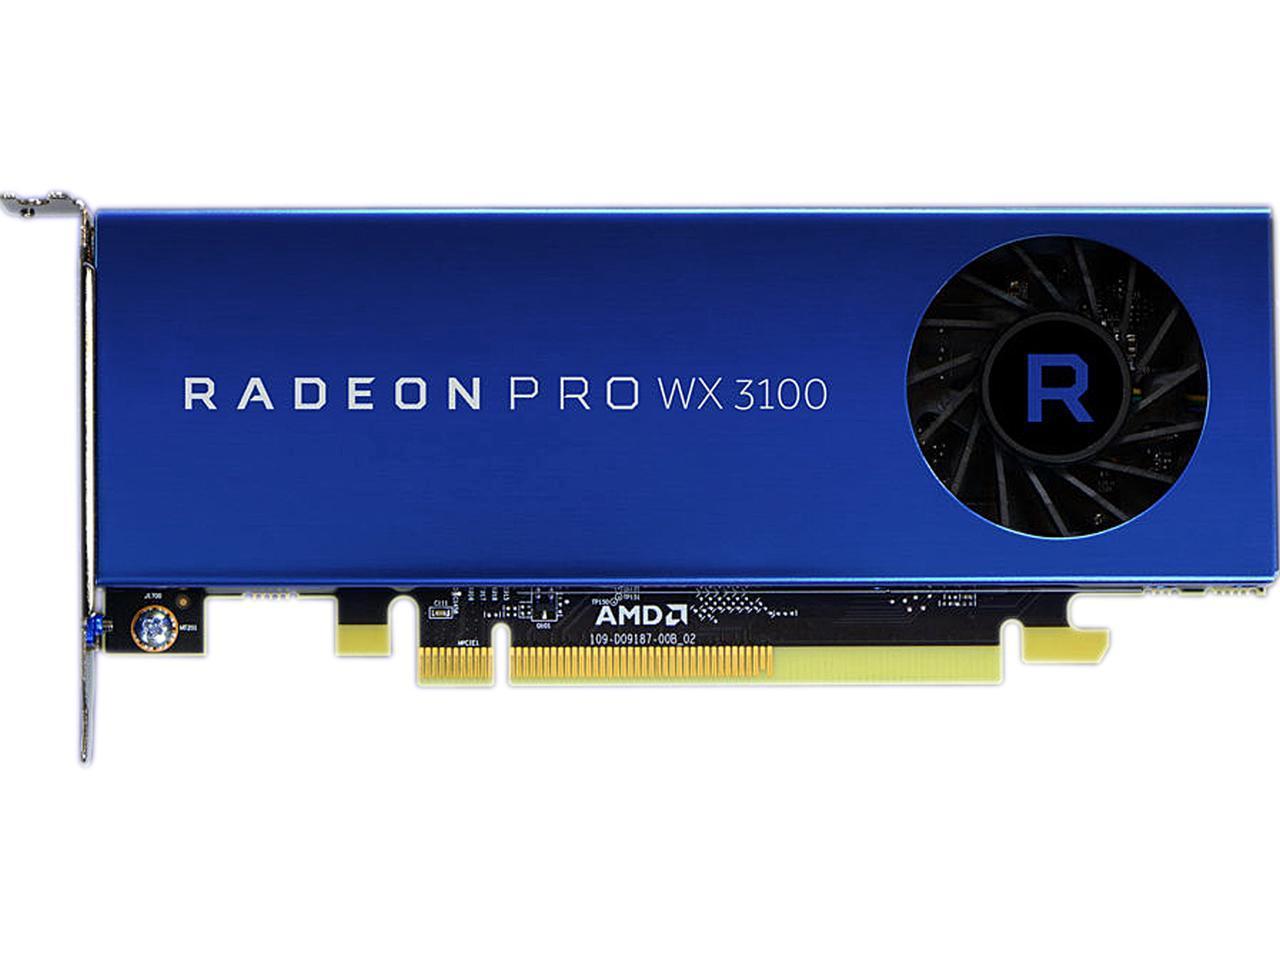 AMD Radeon Pro WX 3100 - 4GB GDDR5, 2xmDP, 1xDP